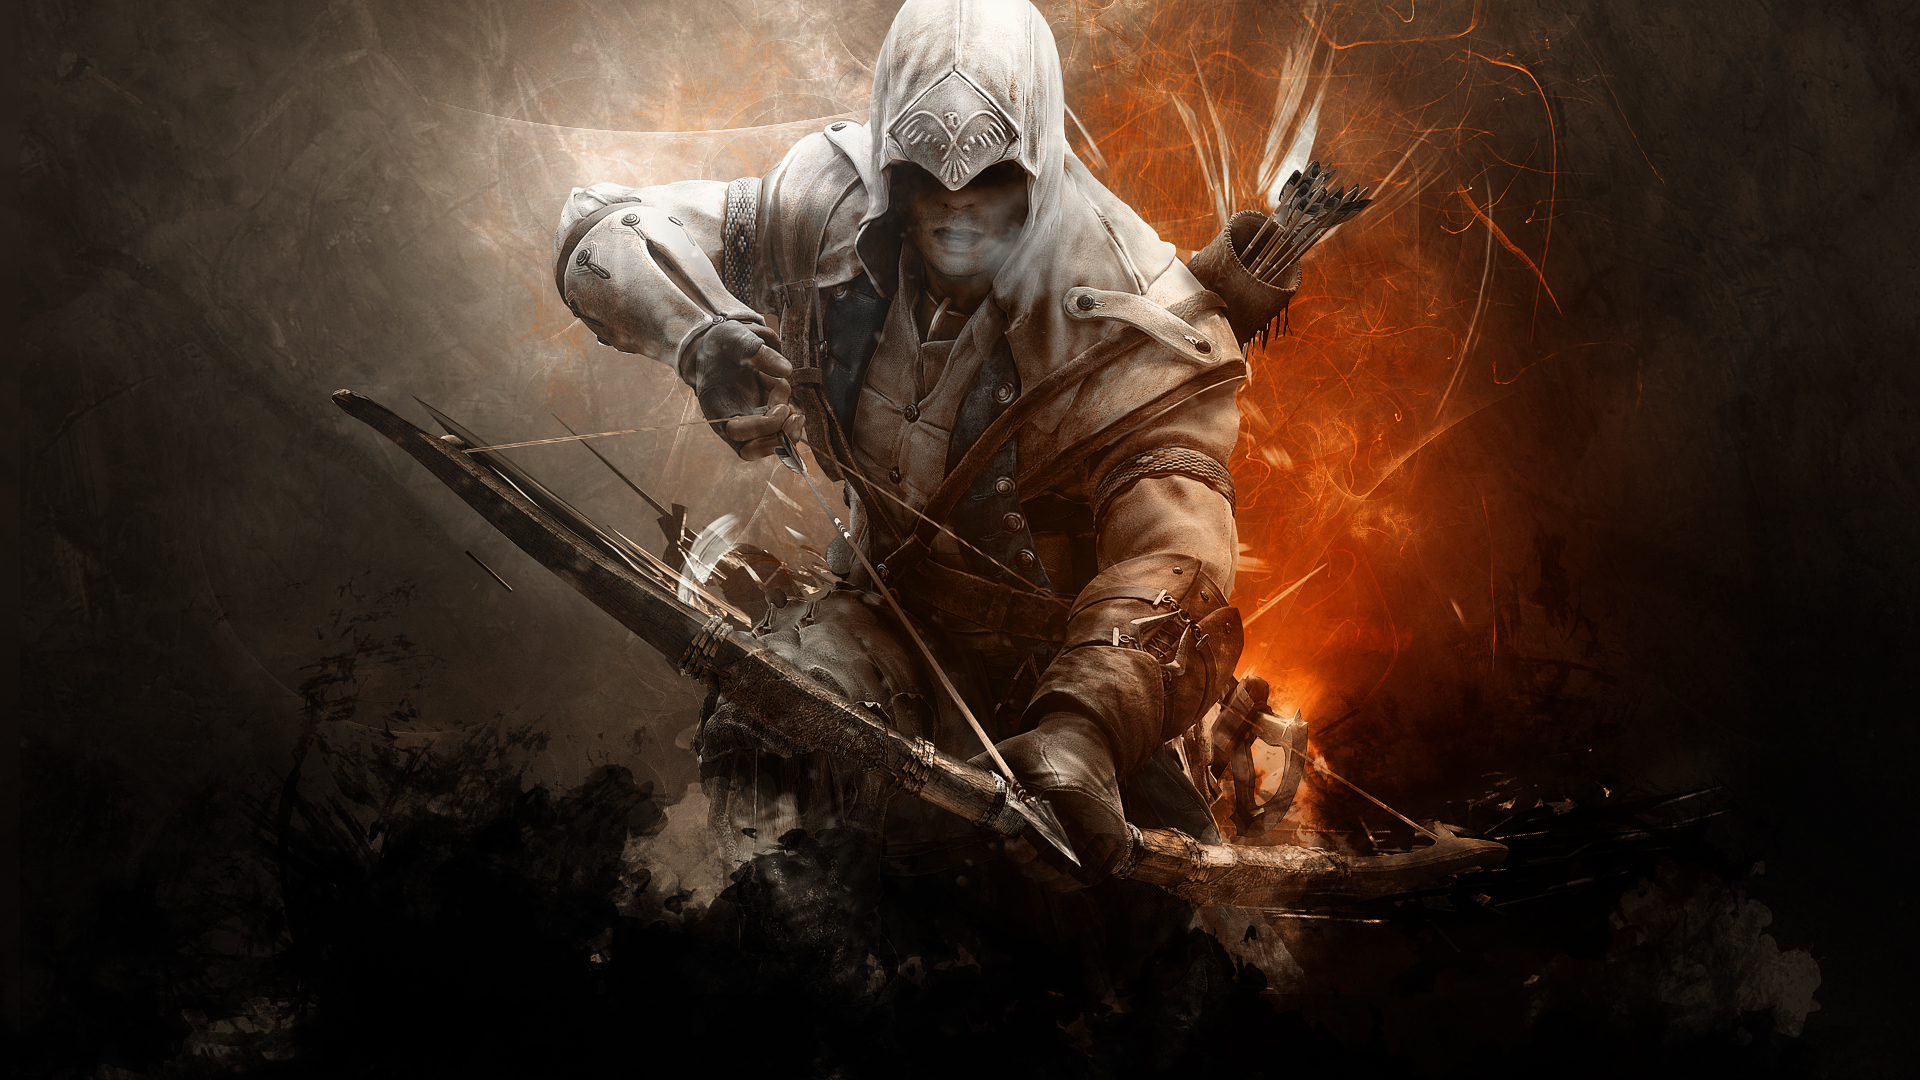 Assassins Creed 3 Connor WALLPAPER 1920x1080